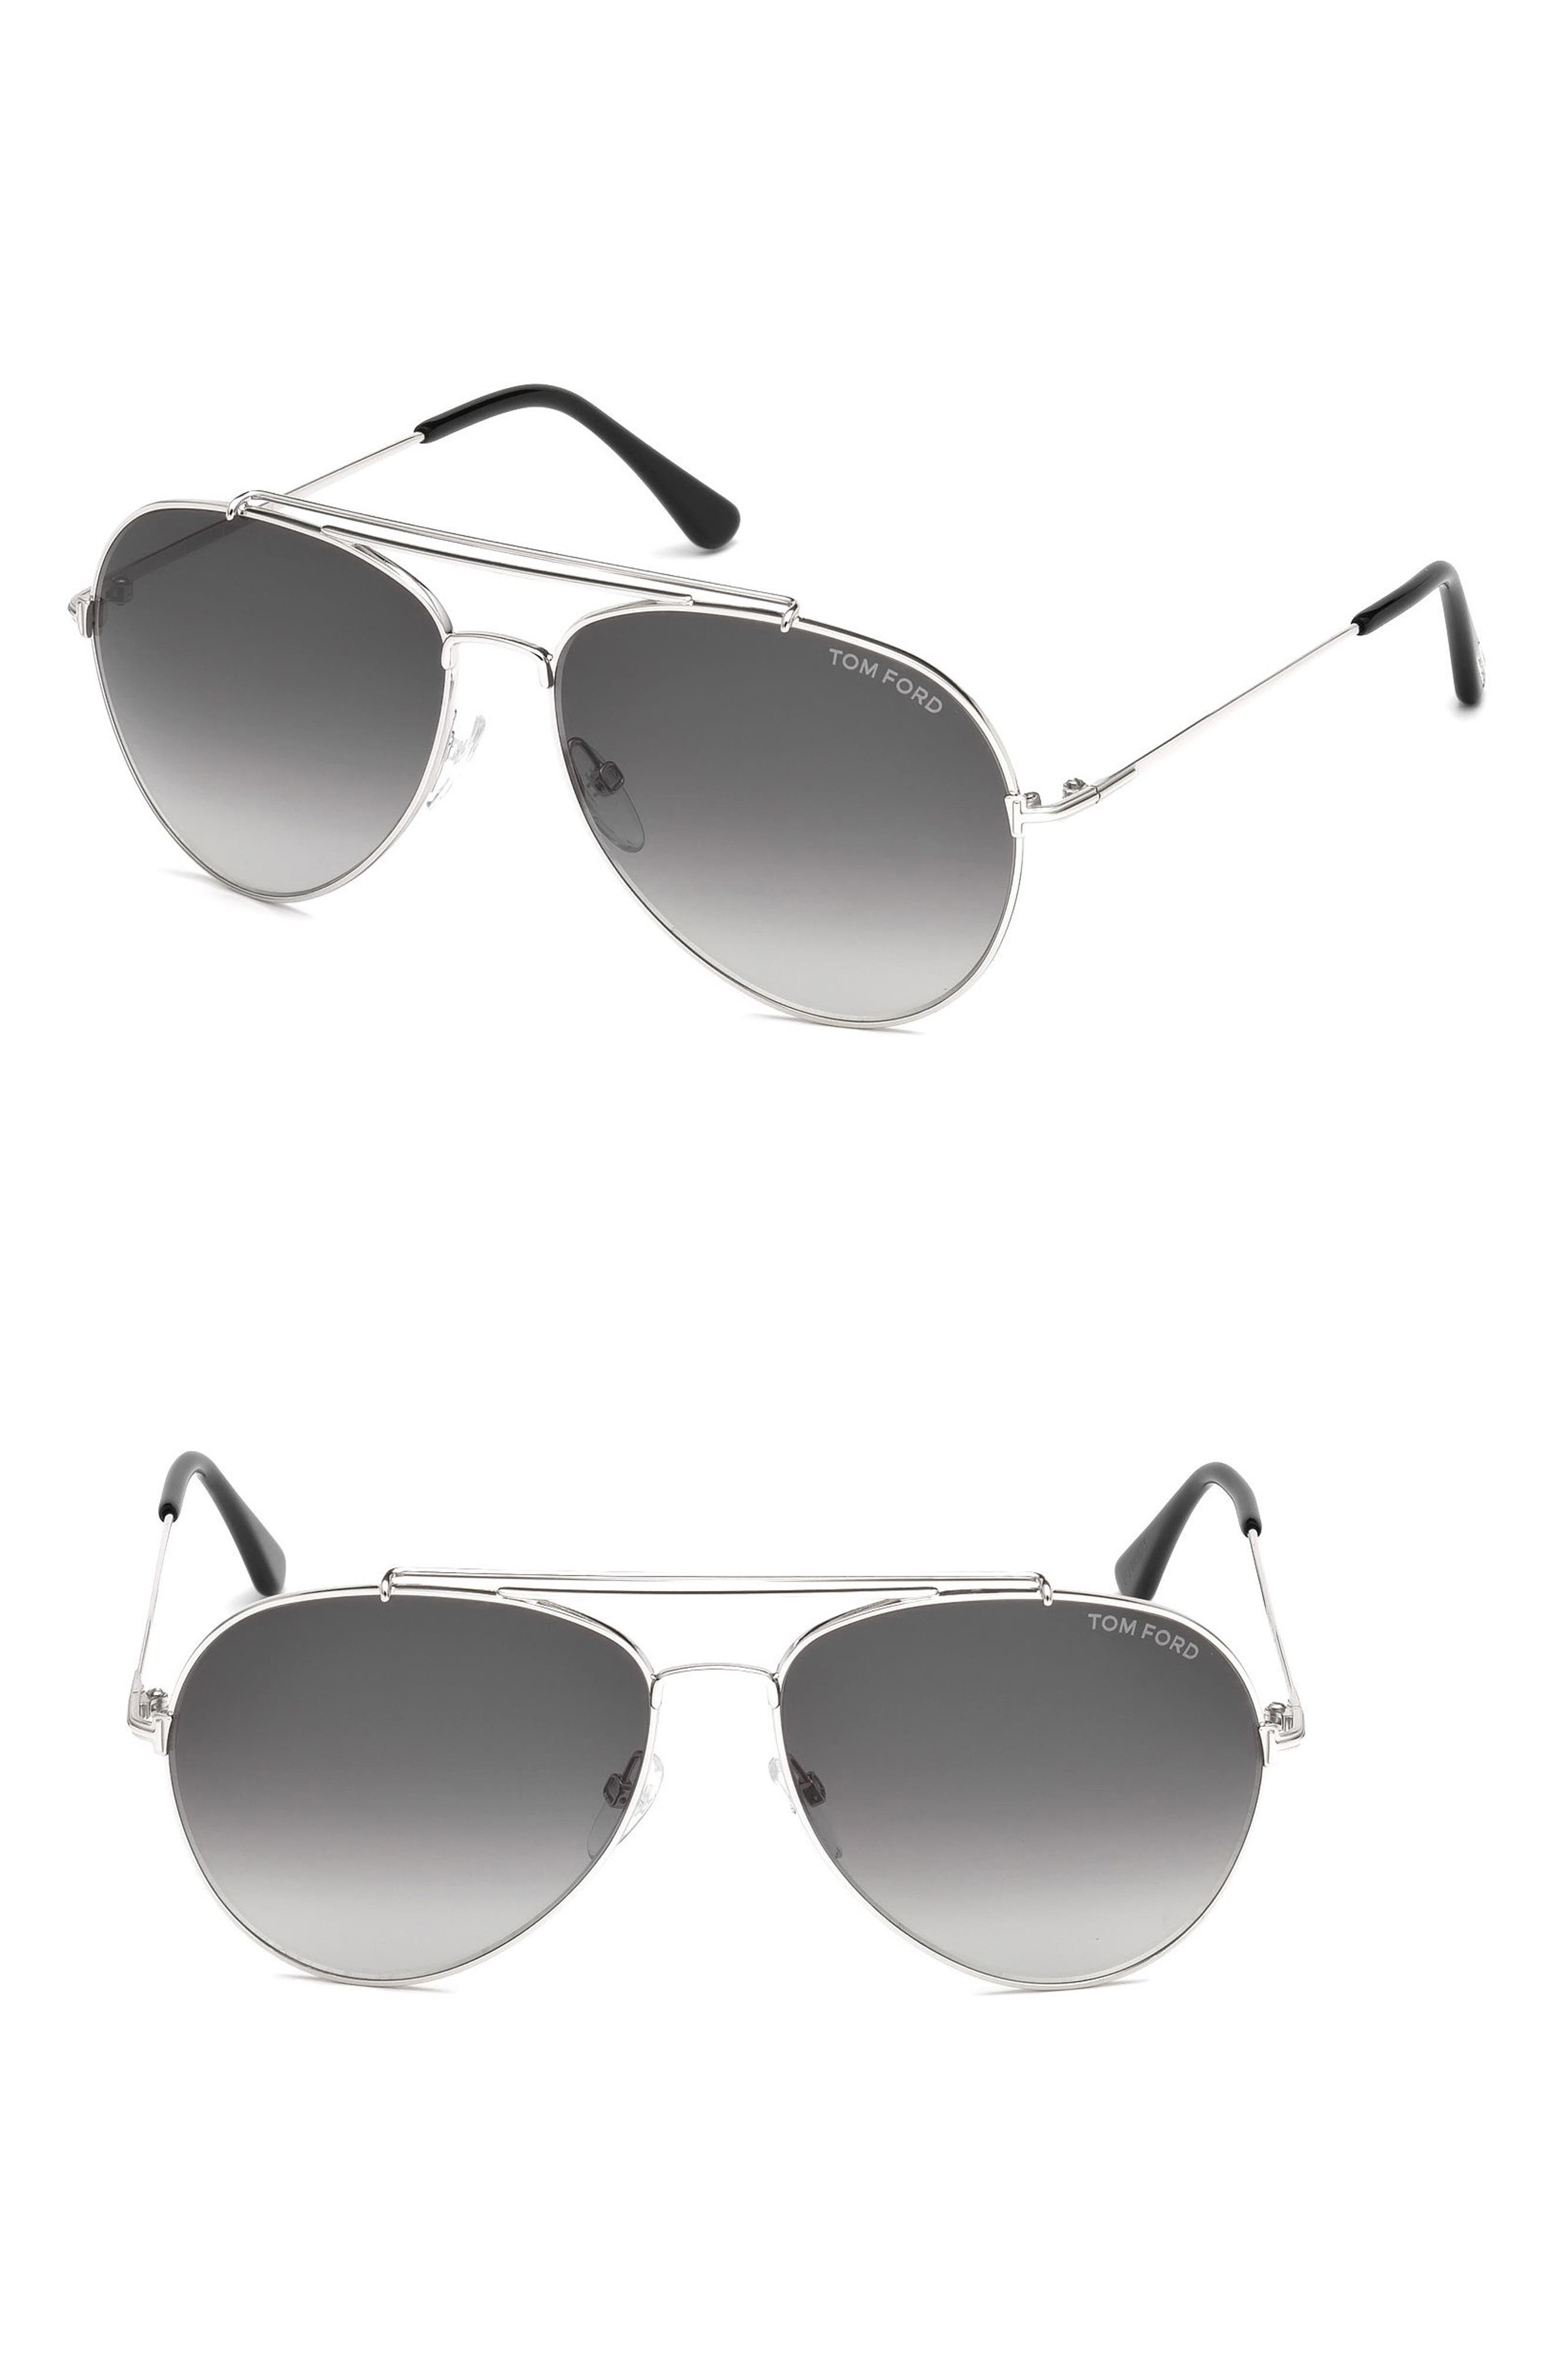 Main Image - Tom Ford 'Charles' 62mm Aviator Sunglasses